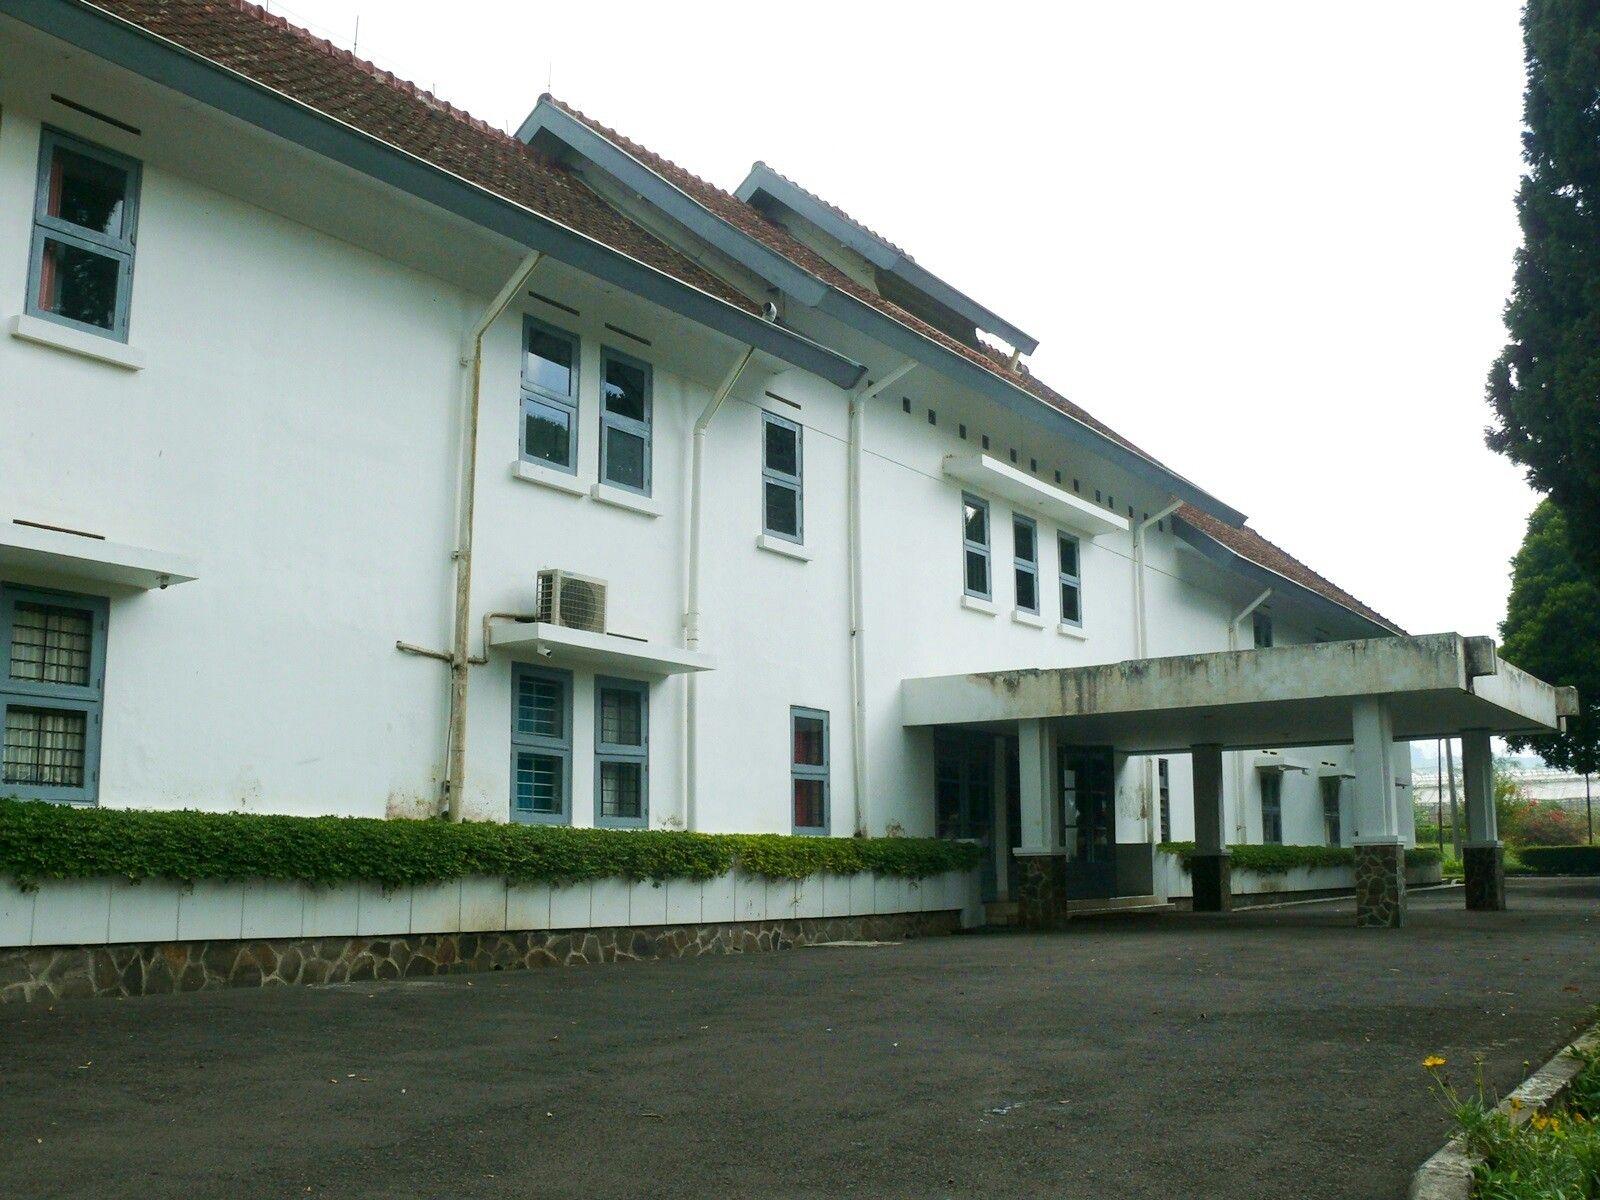 Gedung Balitsa Bekas Rumah Belanda Van De Root Lembang History